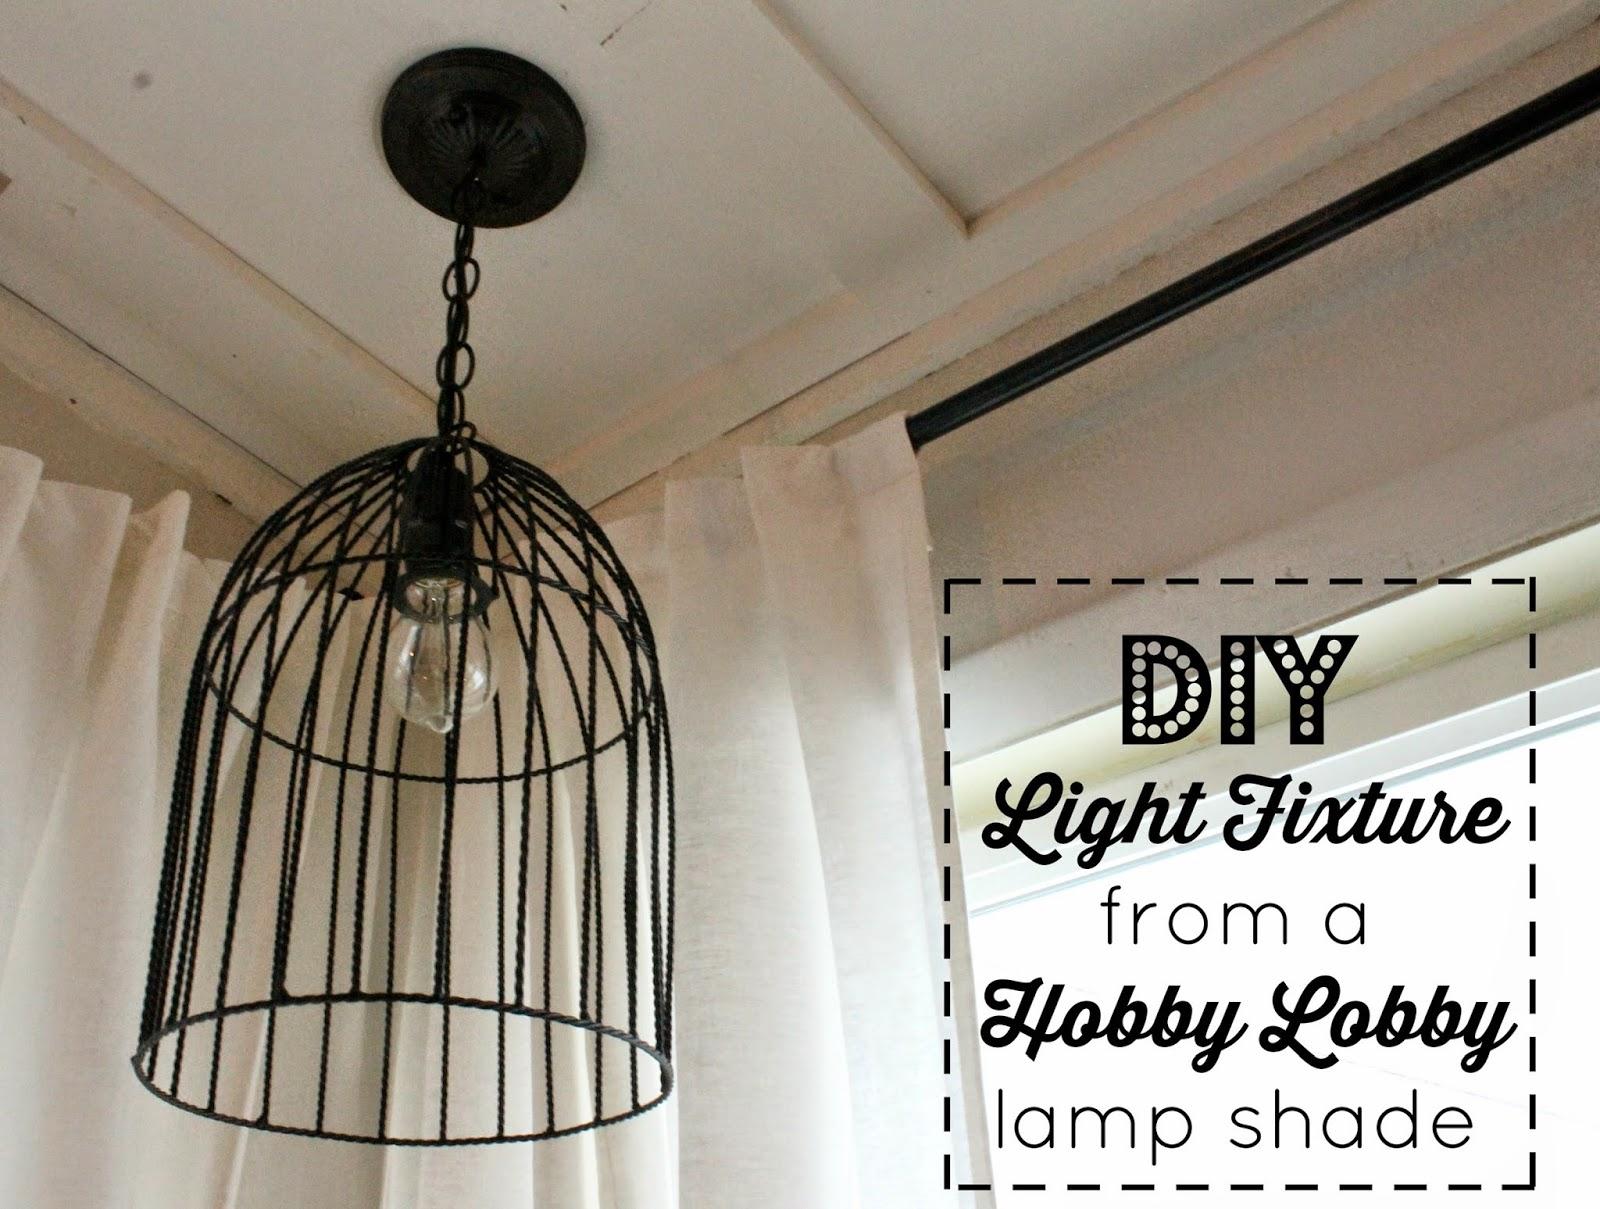 Wonderfully made diy ceiling light fixture - Diy ceiling light fixtures ...